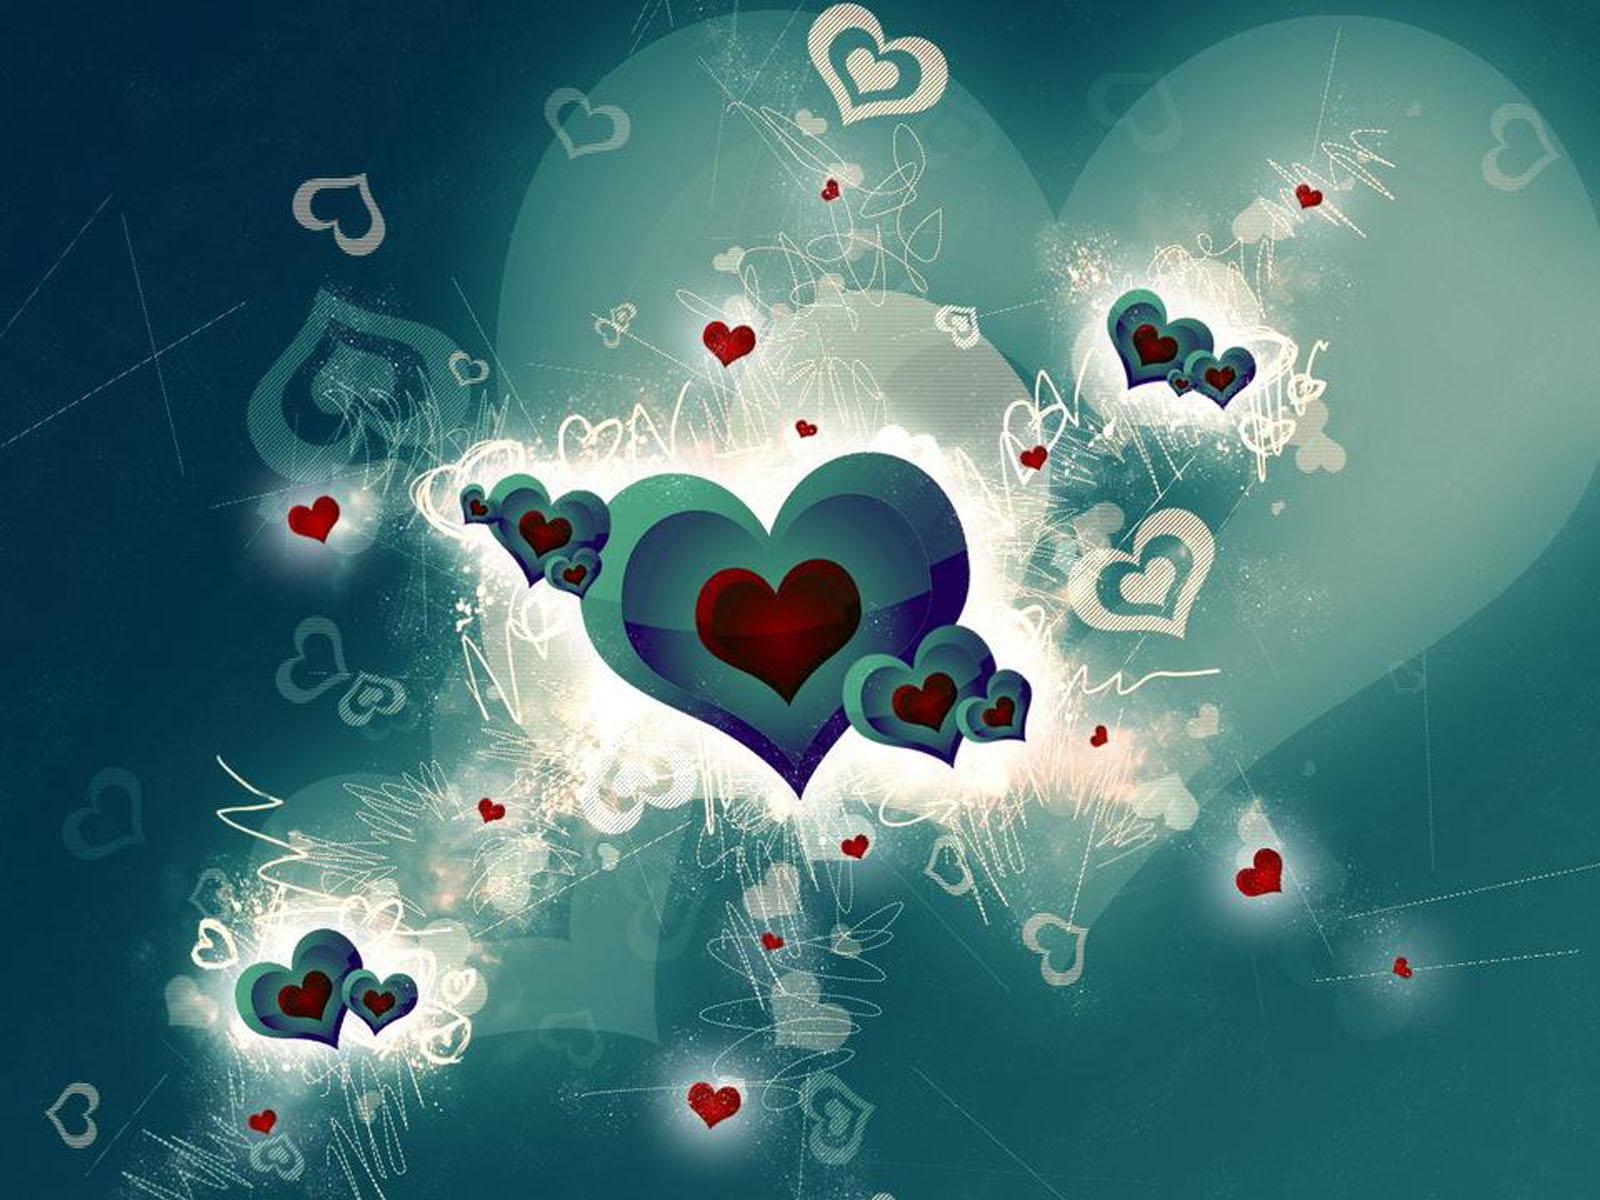 Wallpapers 3d Heart Wallpapers